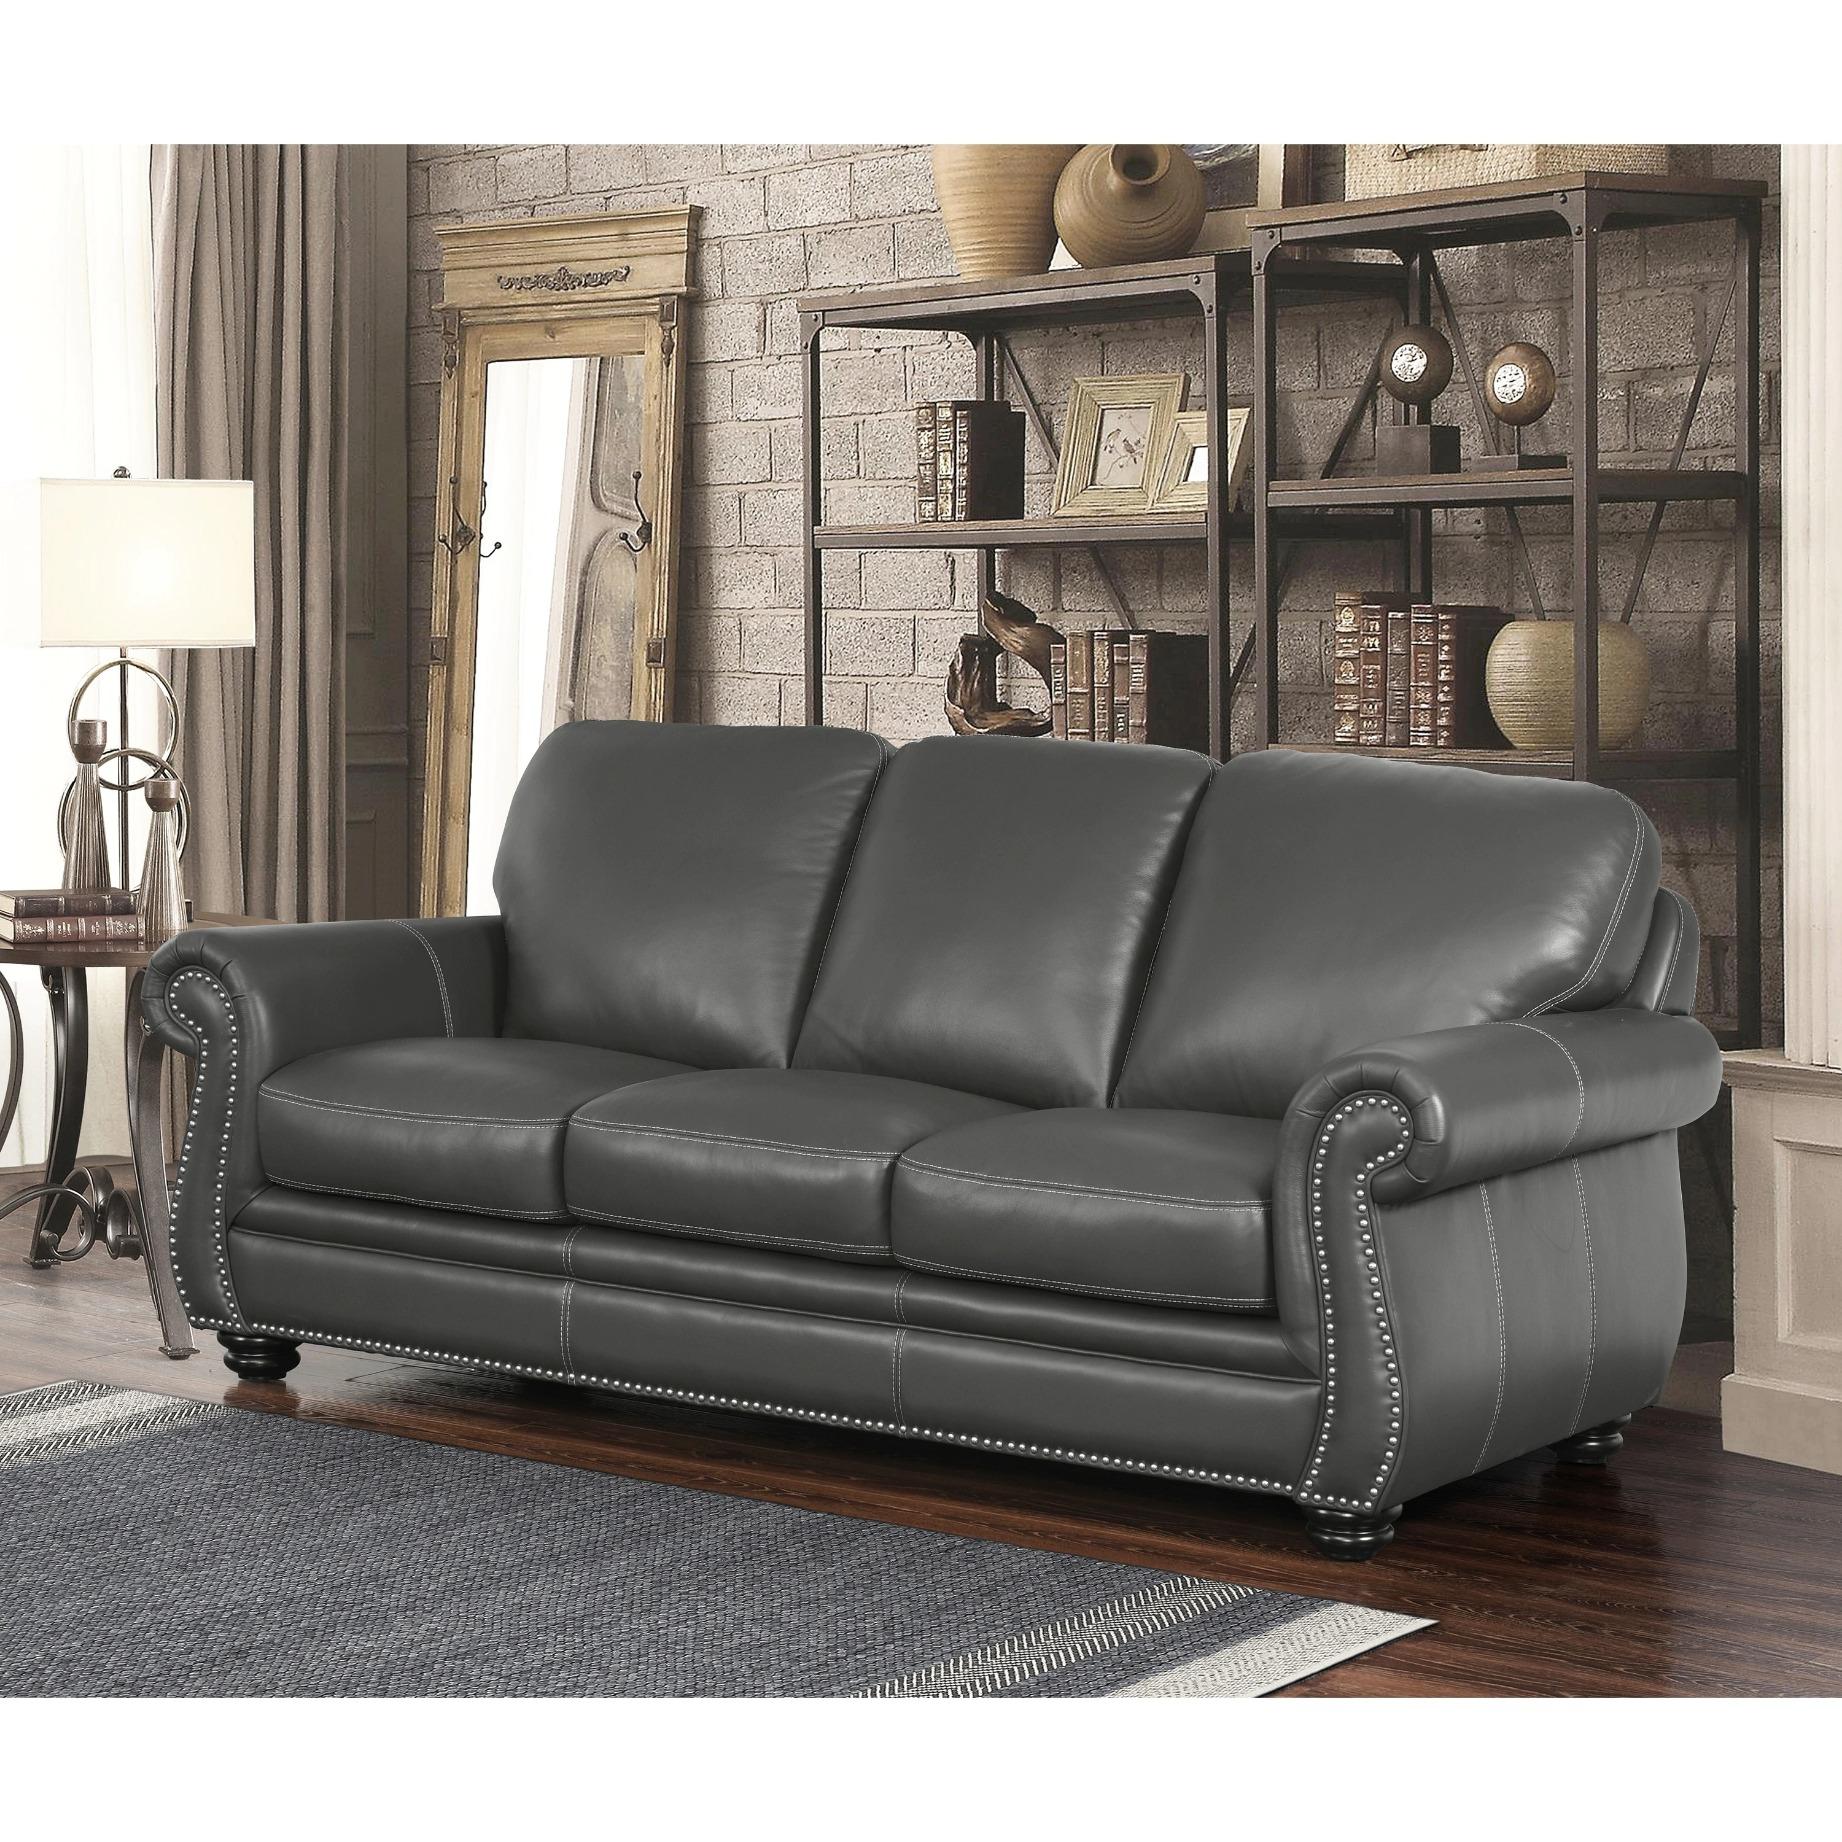 Abbyson Kassidy Grey Leather Sofa